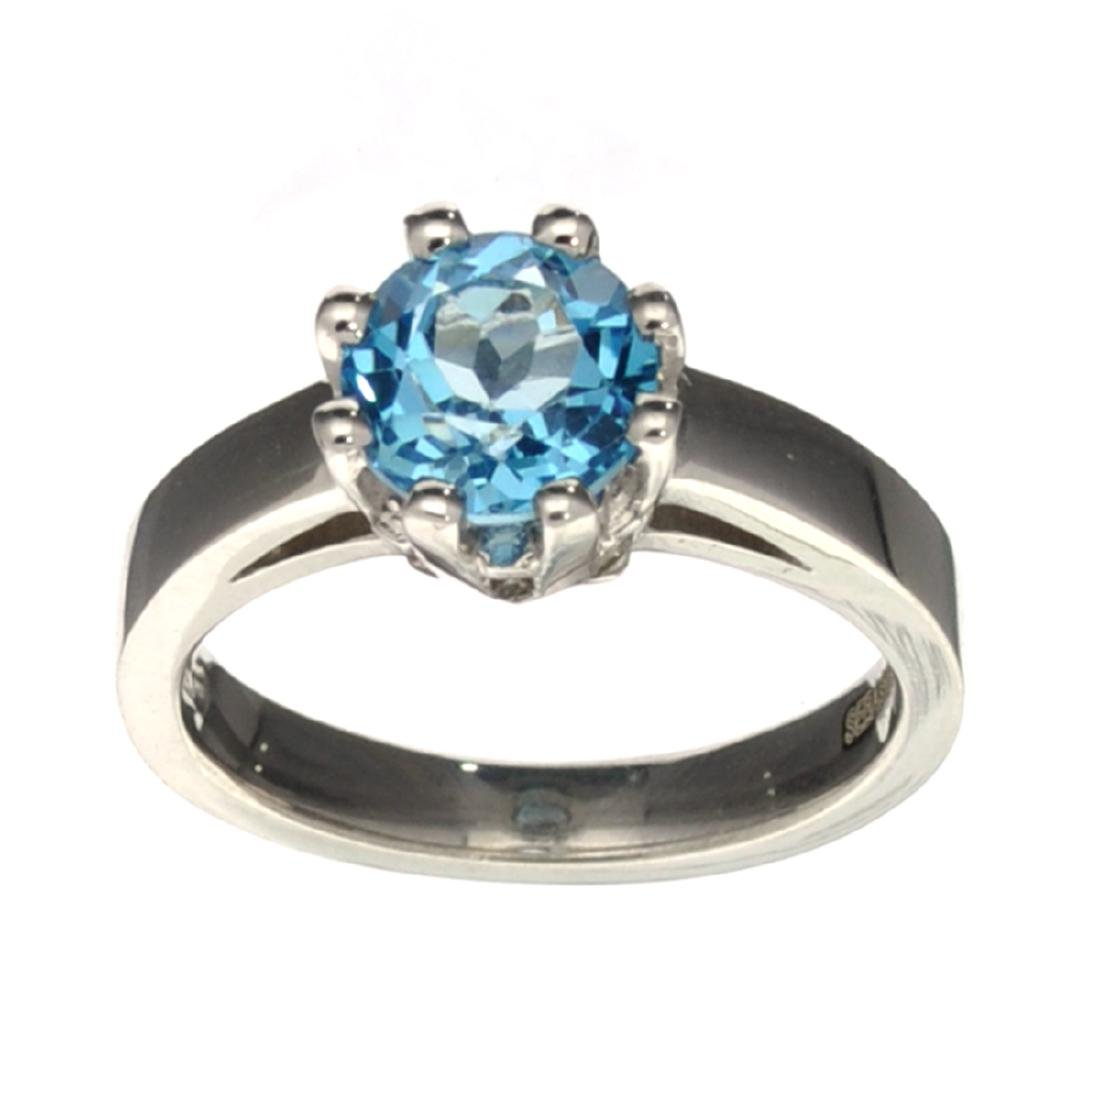 APP: 0.5k Fine Jewelry Designer Sebastian, 1.57CT Round